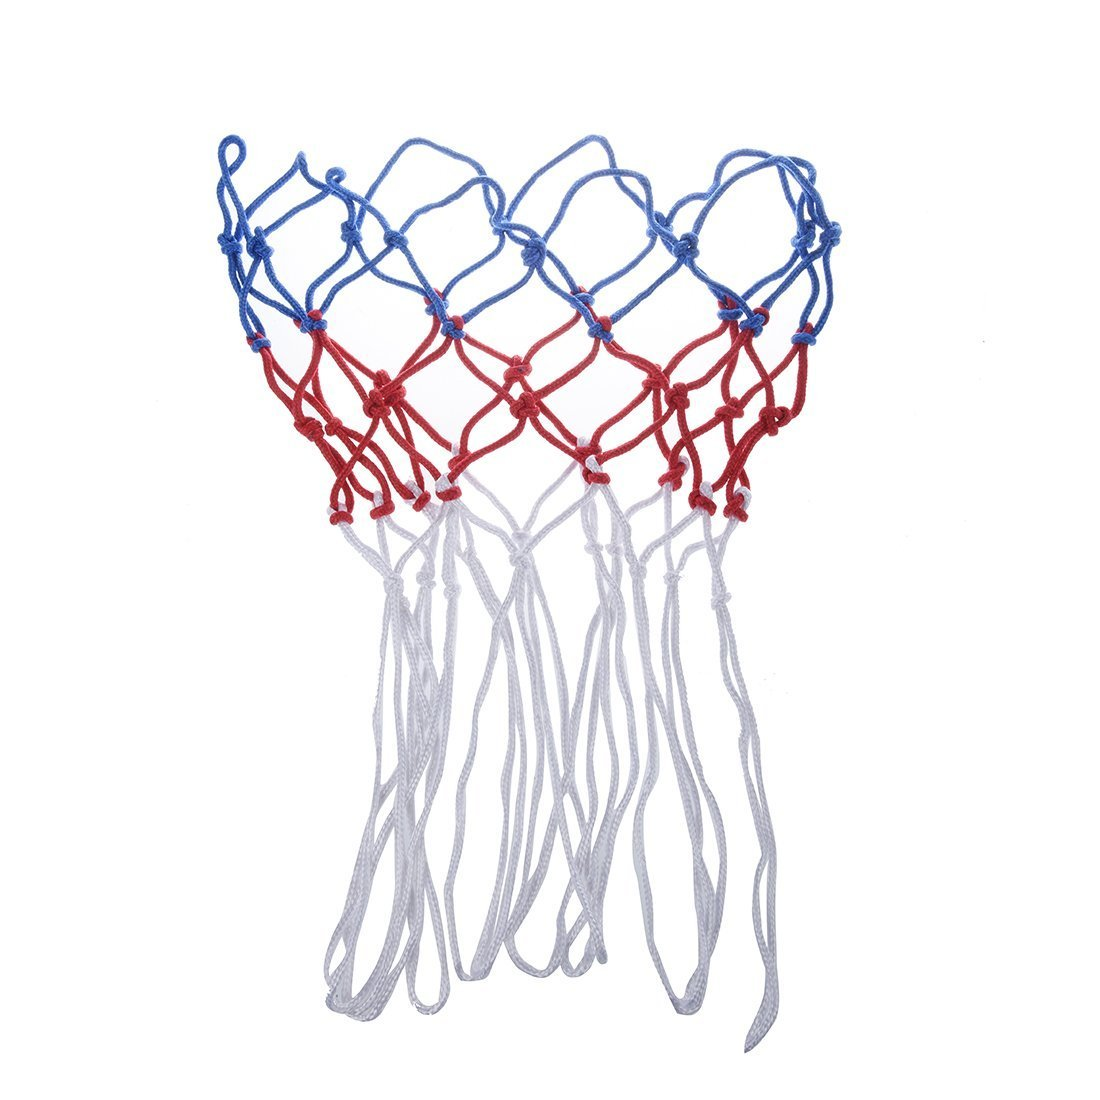 TOOGOO (R) Red de Baloncesto Nilon Estandar Duradero para Partido Entrenamiento SODIAL(R)